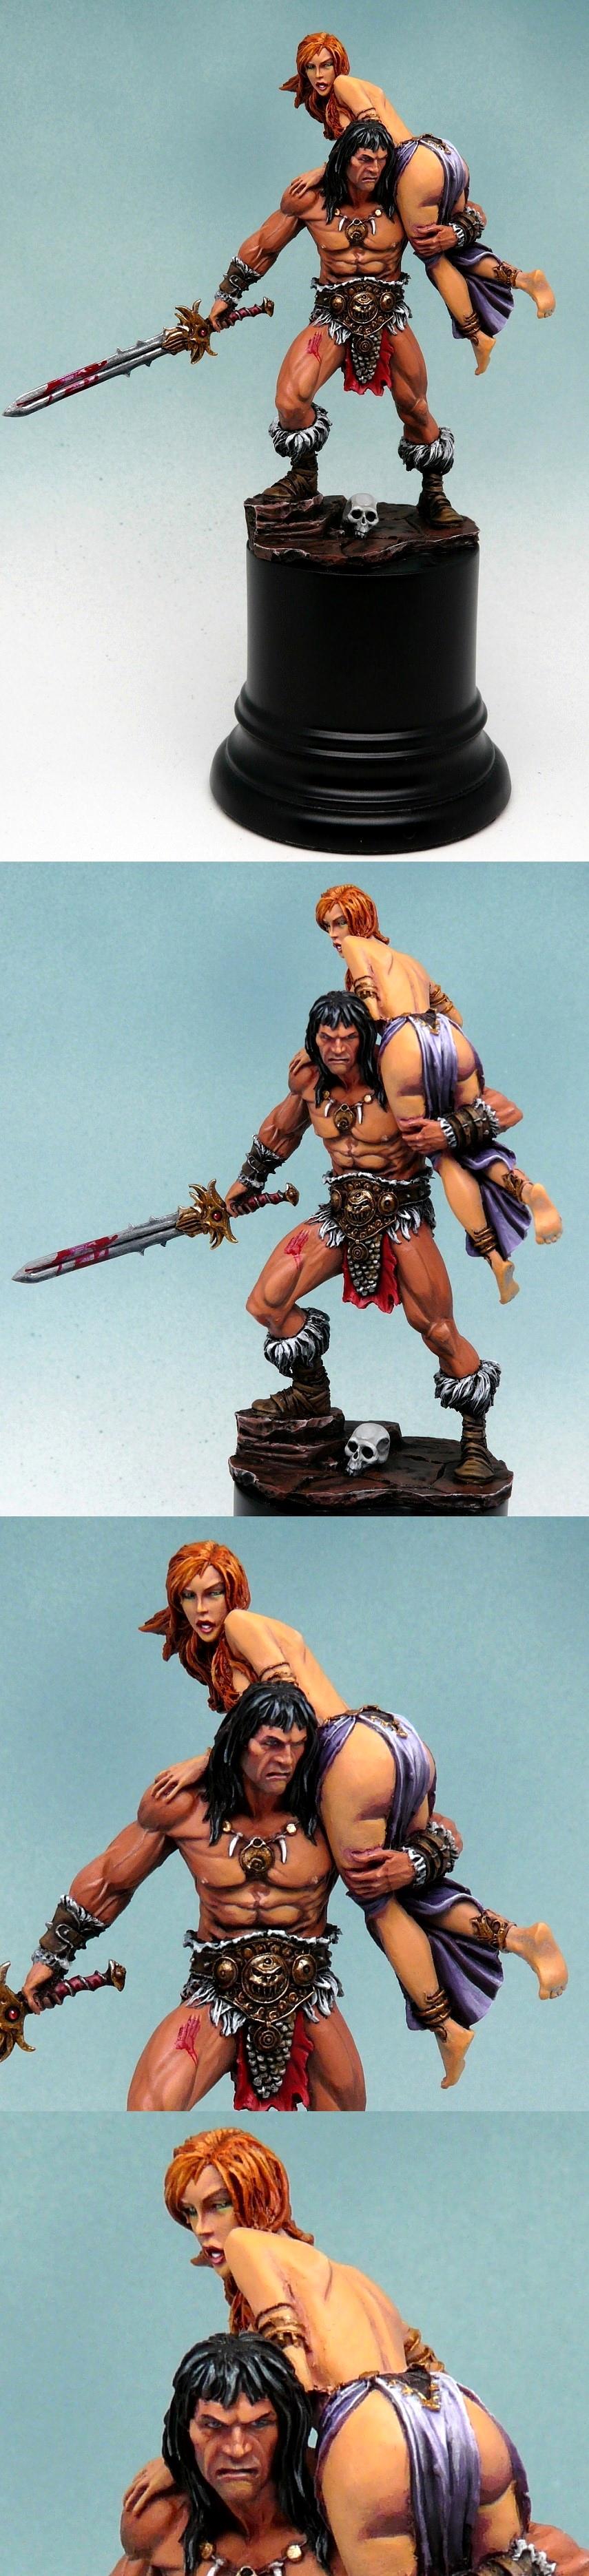 Conan and the lost princess